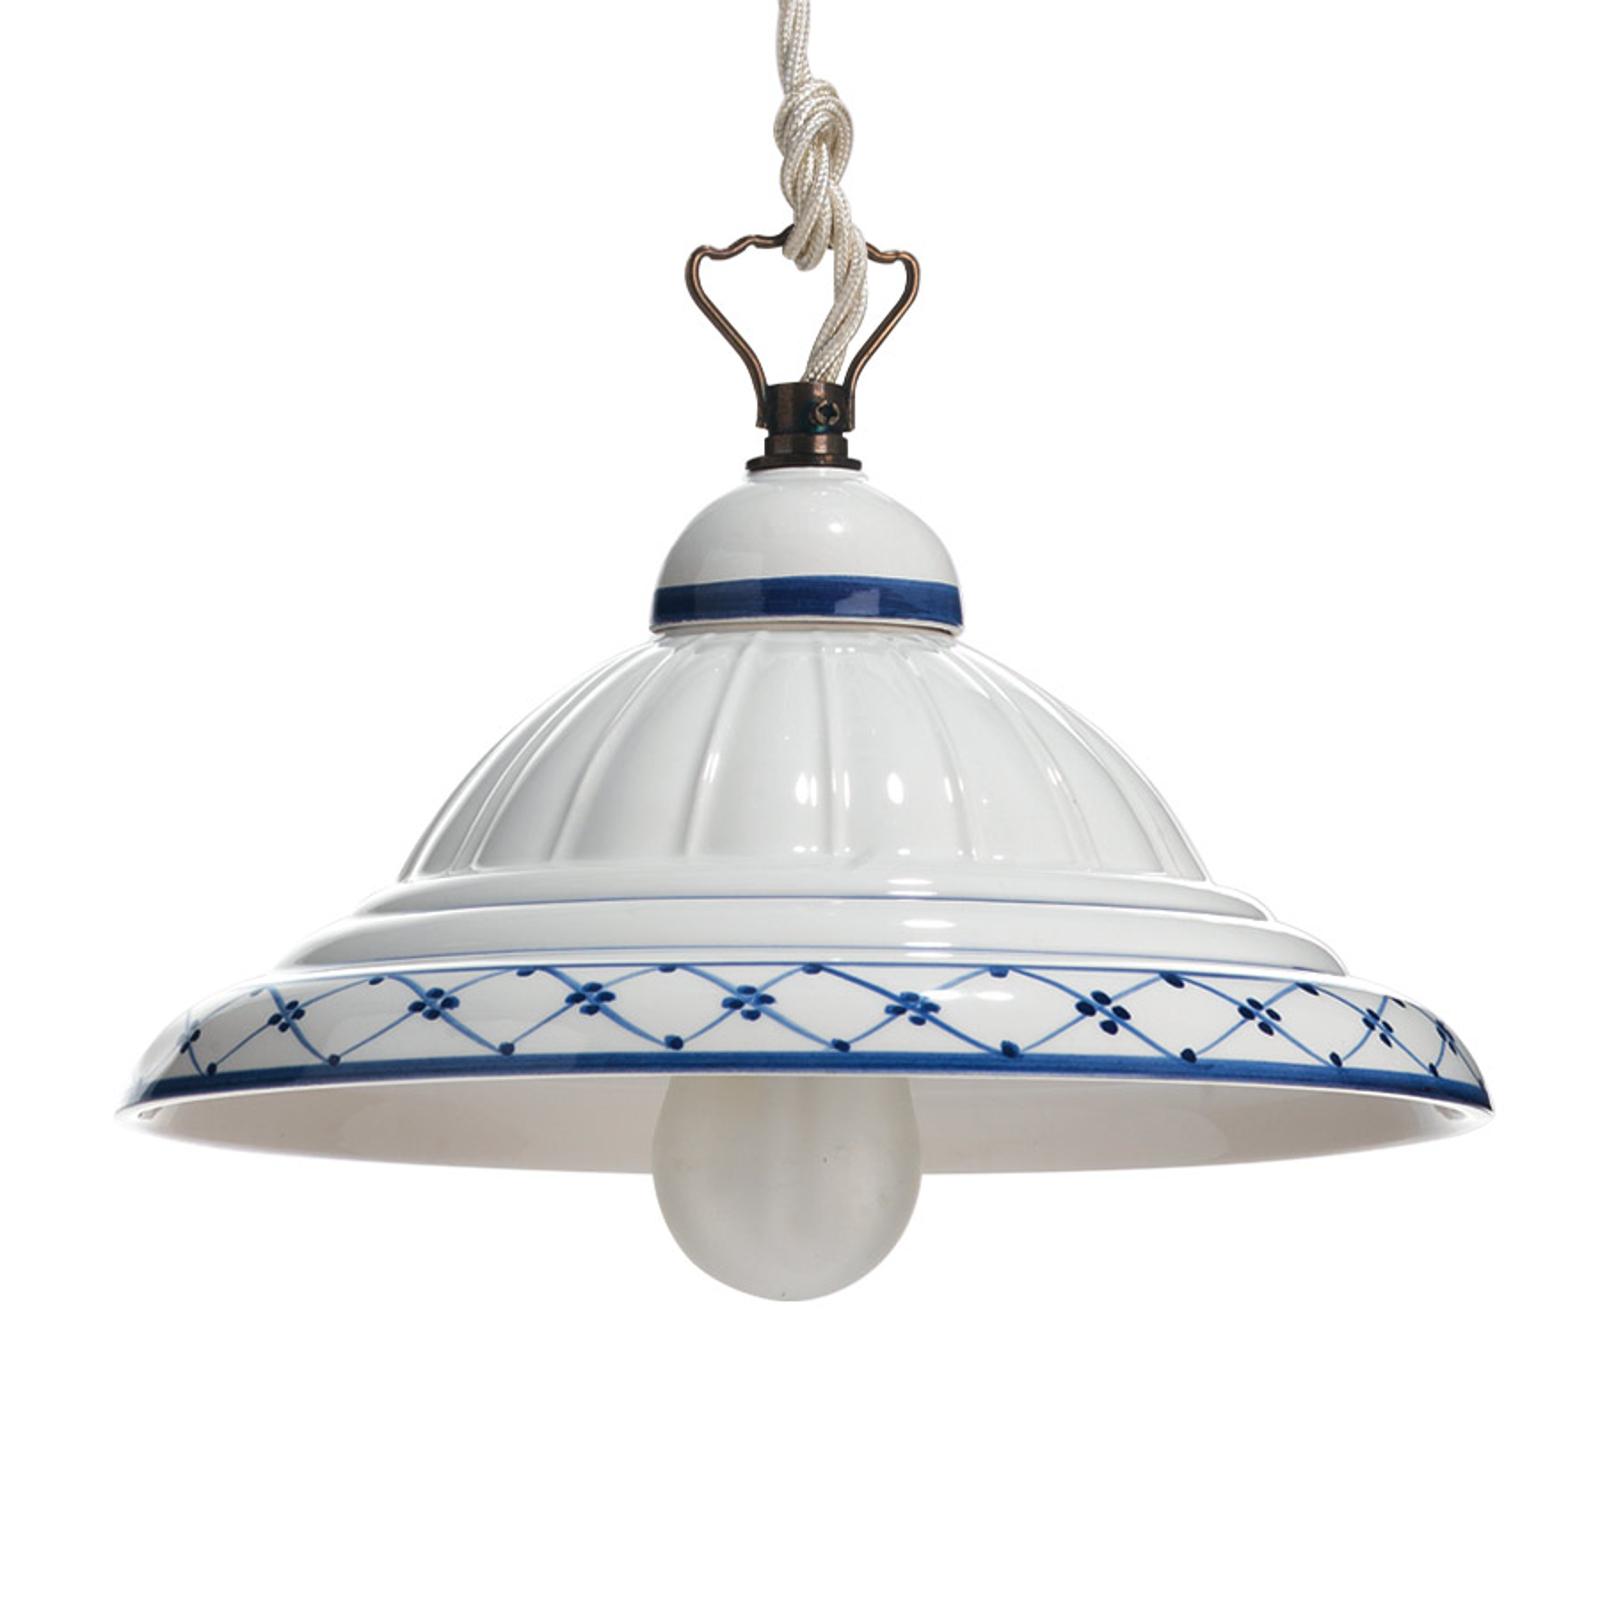 Lámpara colgante Firenze, cerámica, estilo rústico